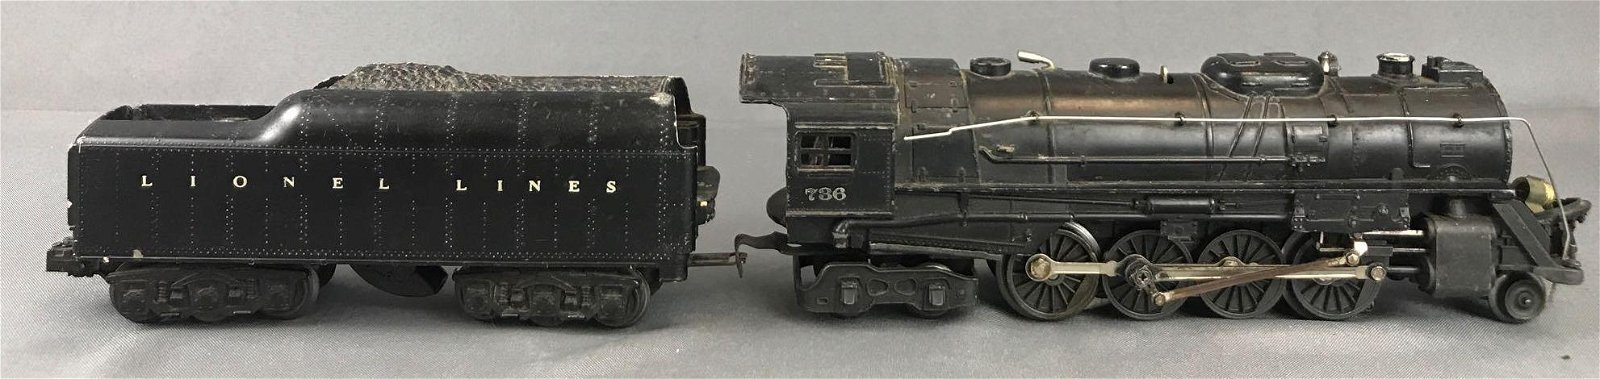 2 piece set O scale Lionel 736 locomotive with tender